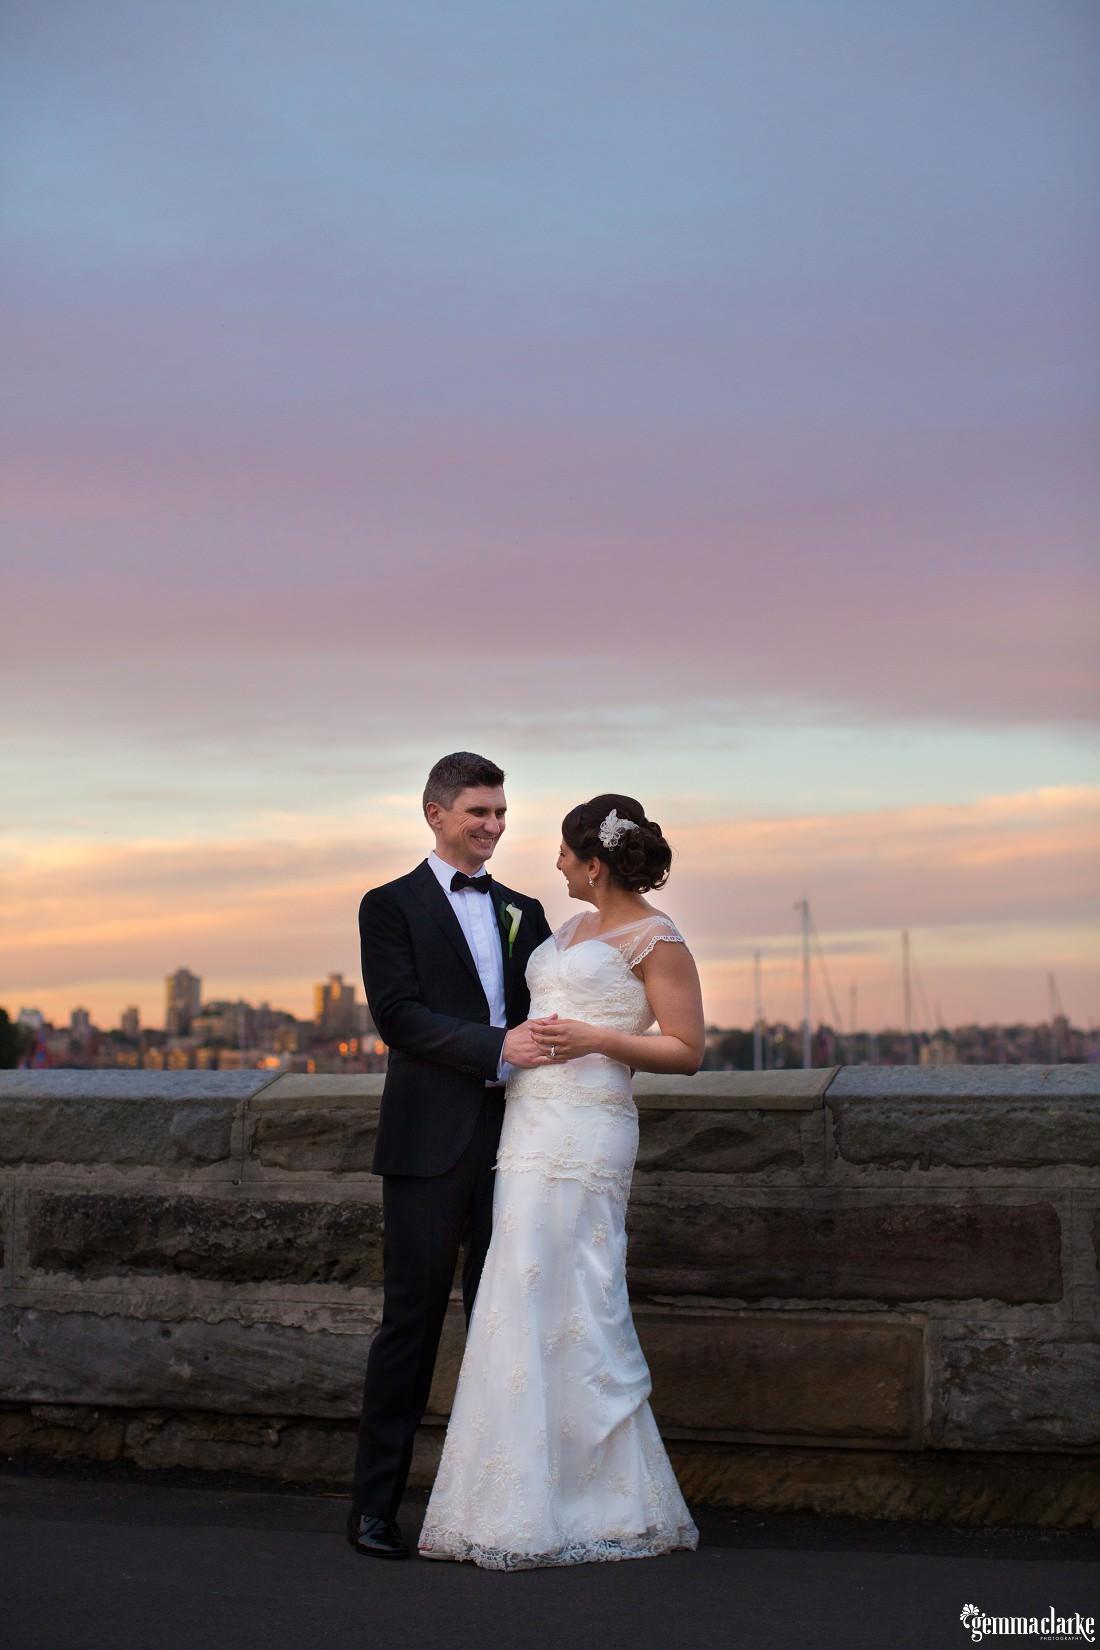 gemma-clarke-photography_botanic-gardens-wedding-reception_amanda-and-dylan_0059